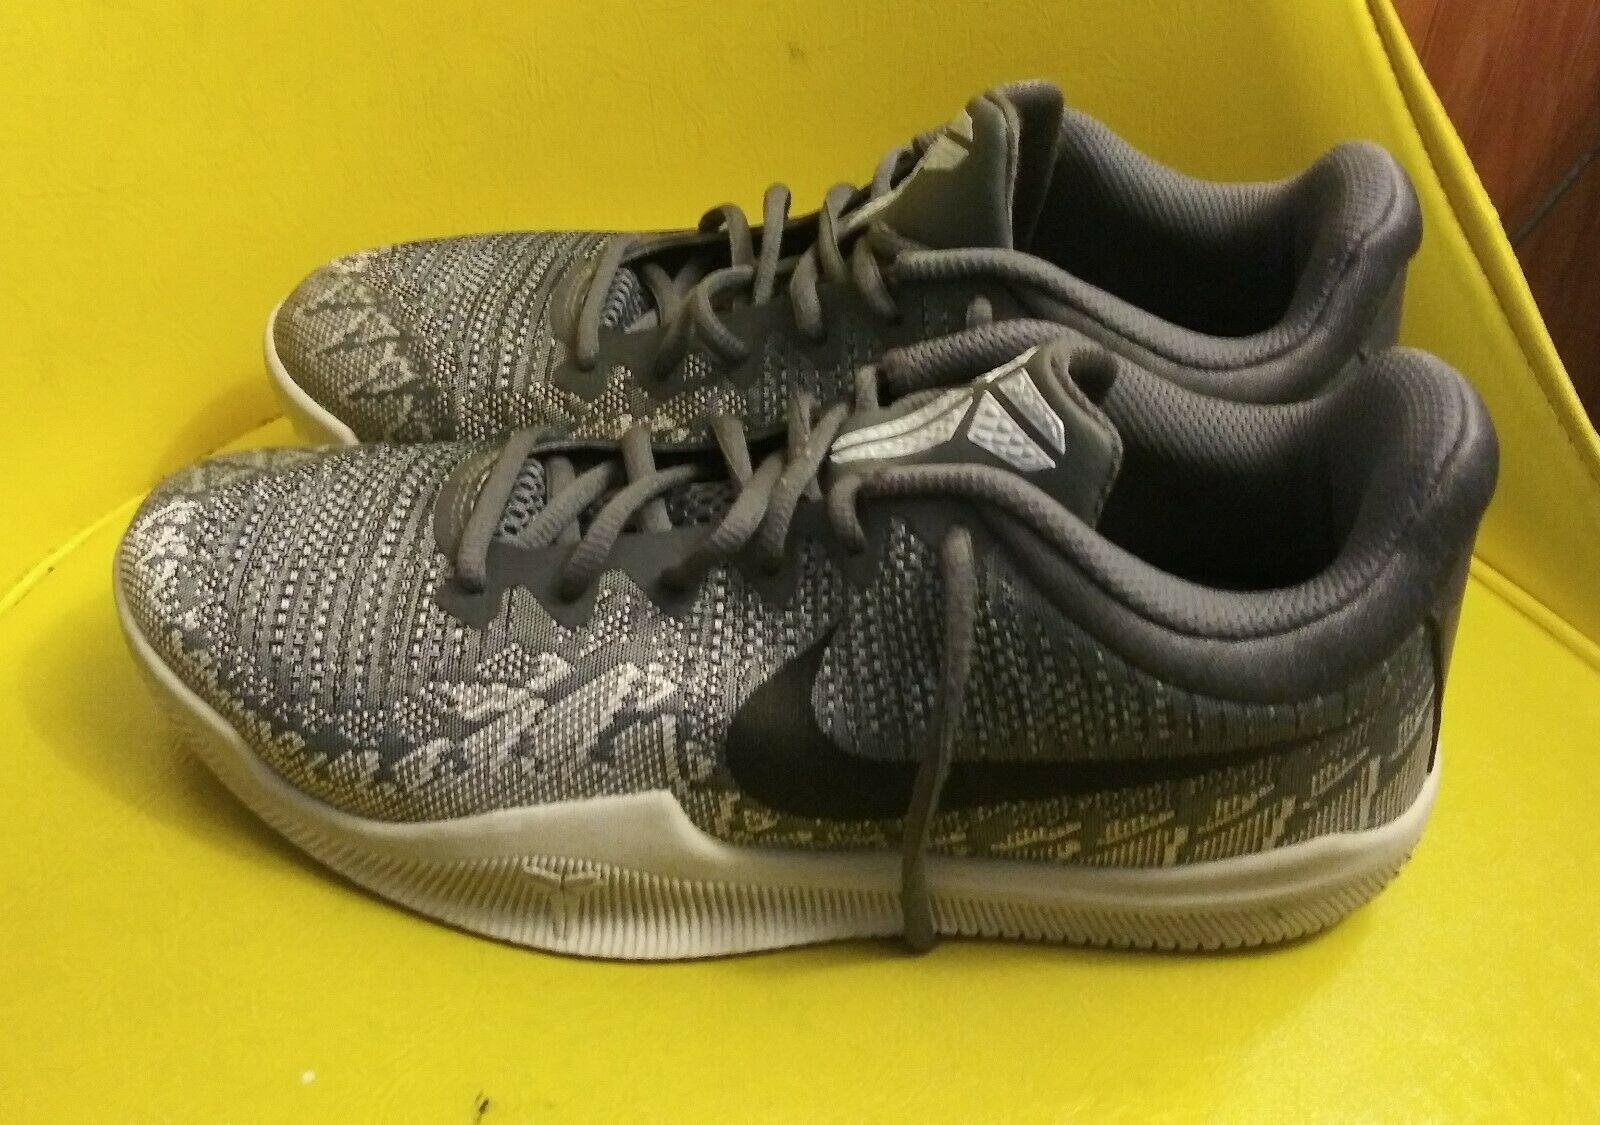 NIKE Kobe Mamba Rage Basketball Shoe 908972-011 Size US 8 / EUR 41 image 4